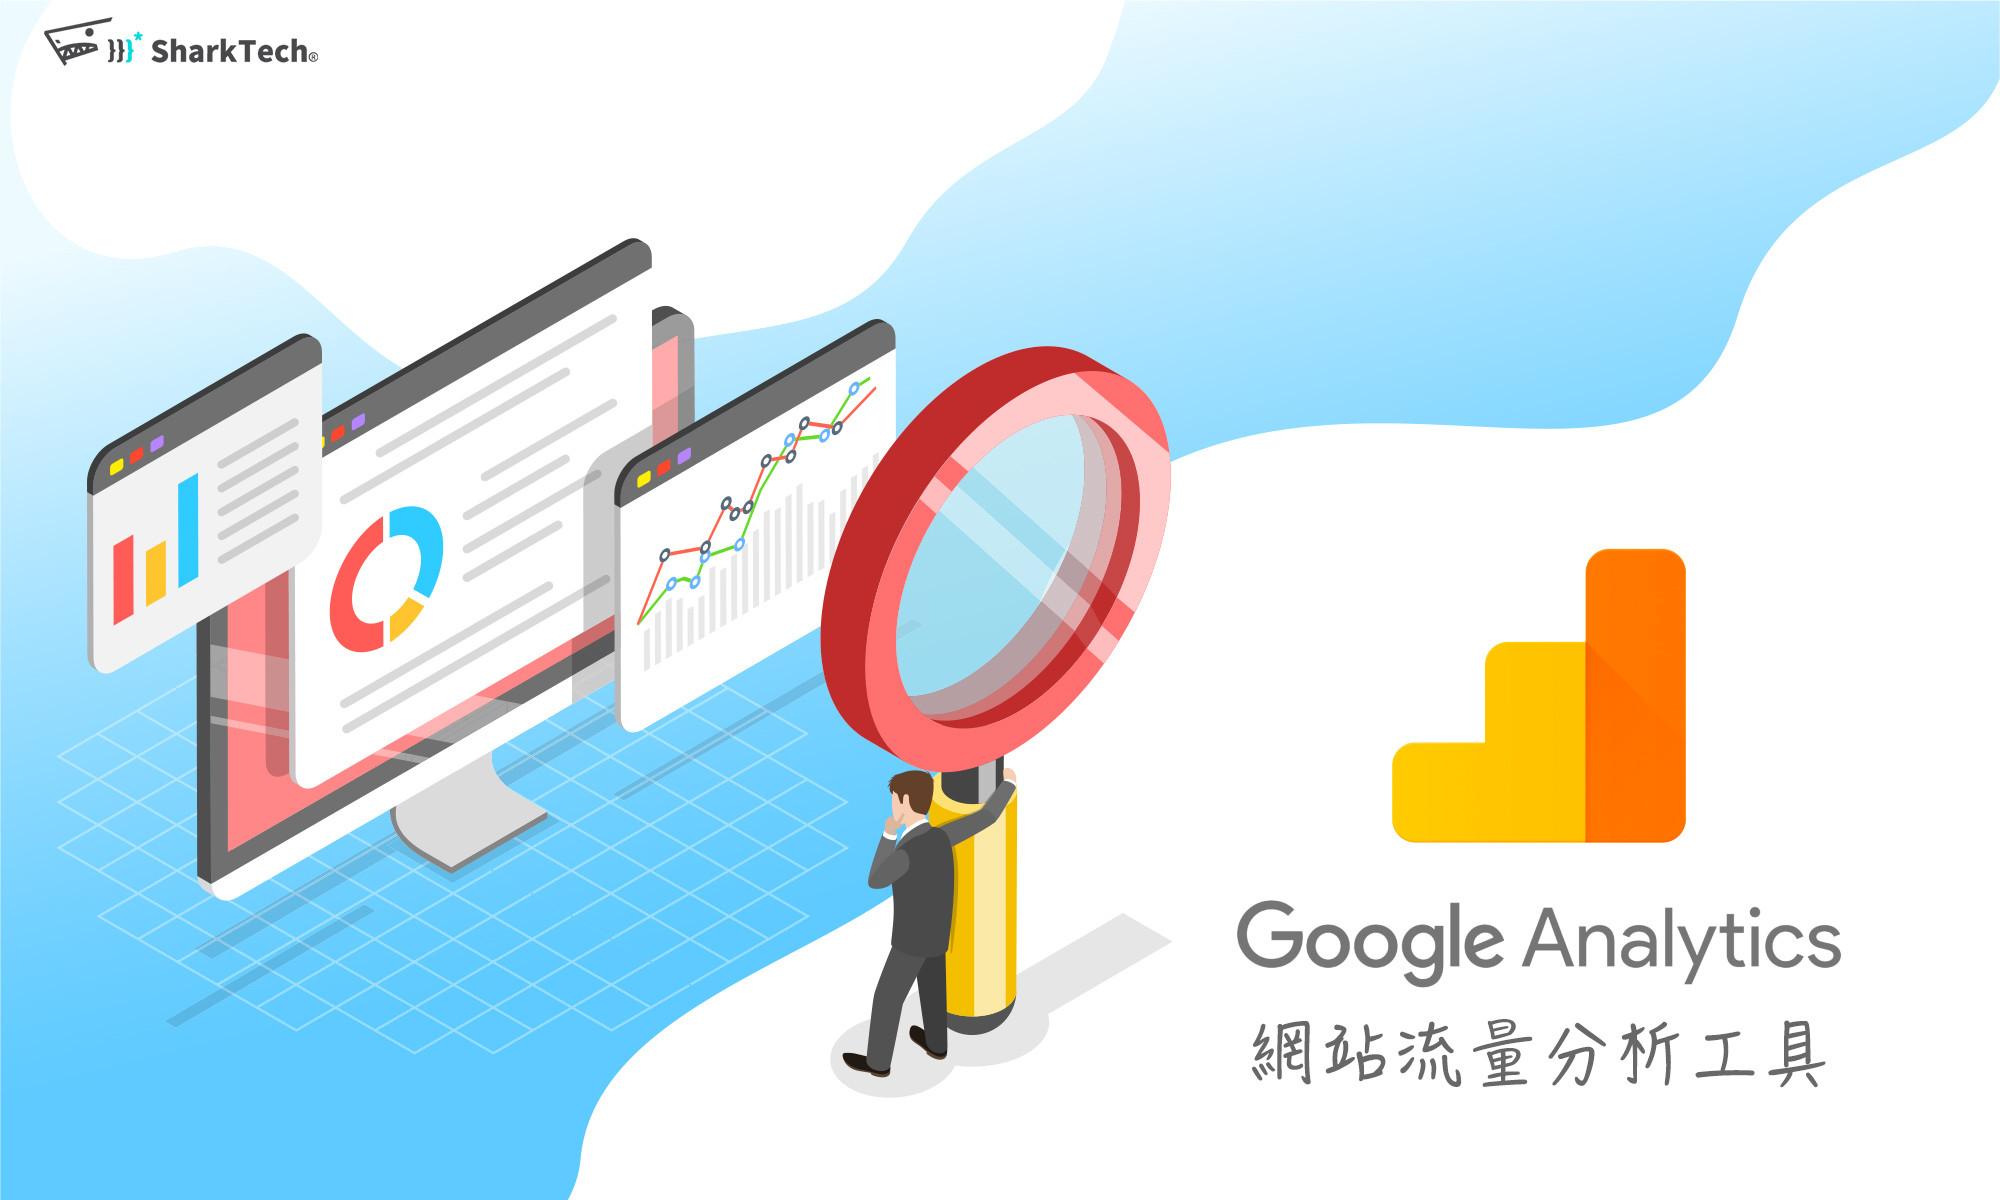 Google Analytics網站分析工具首圖-鯊客科技網站SEO優化公司